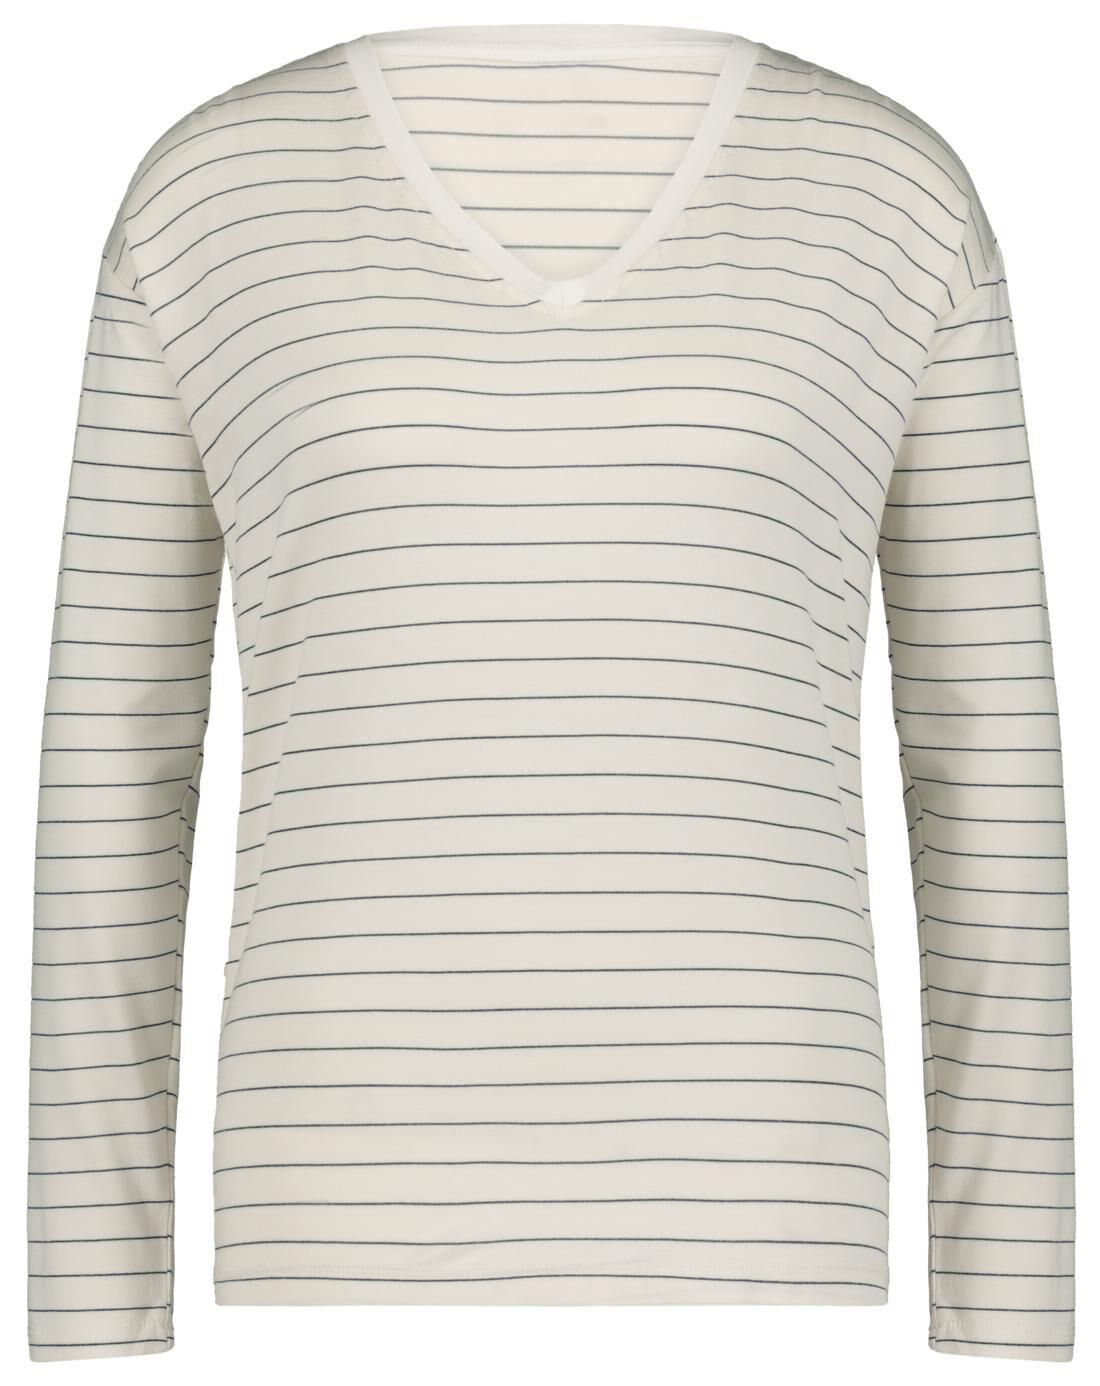 HEMA Dames T-shirt Streep Wit (wit)